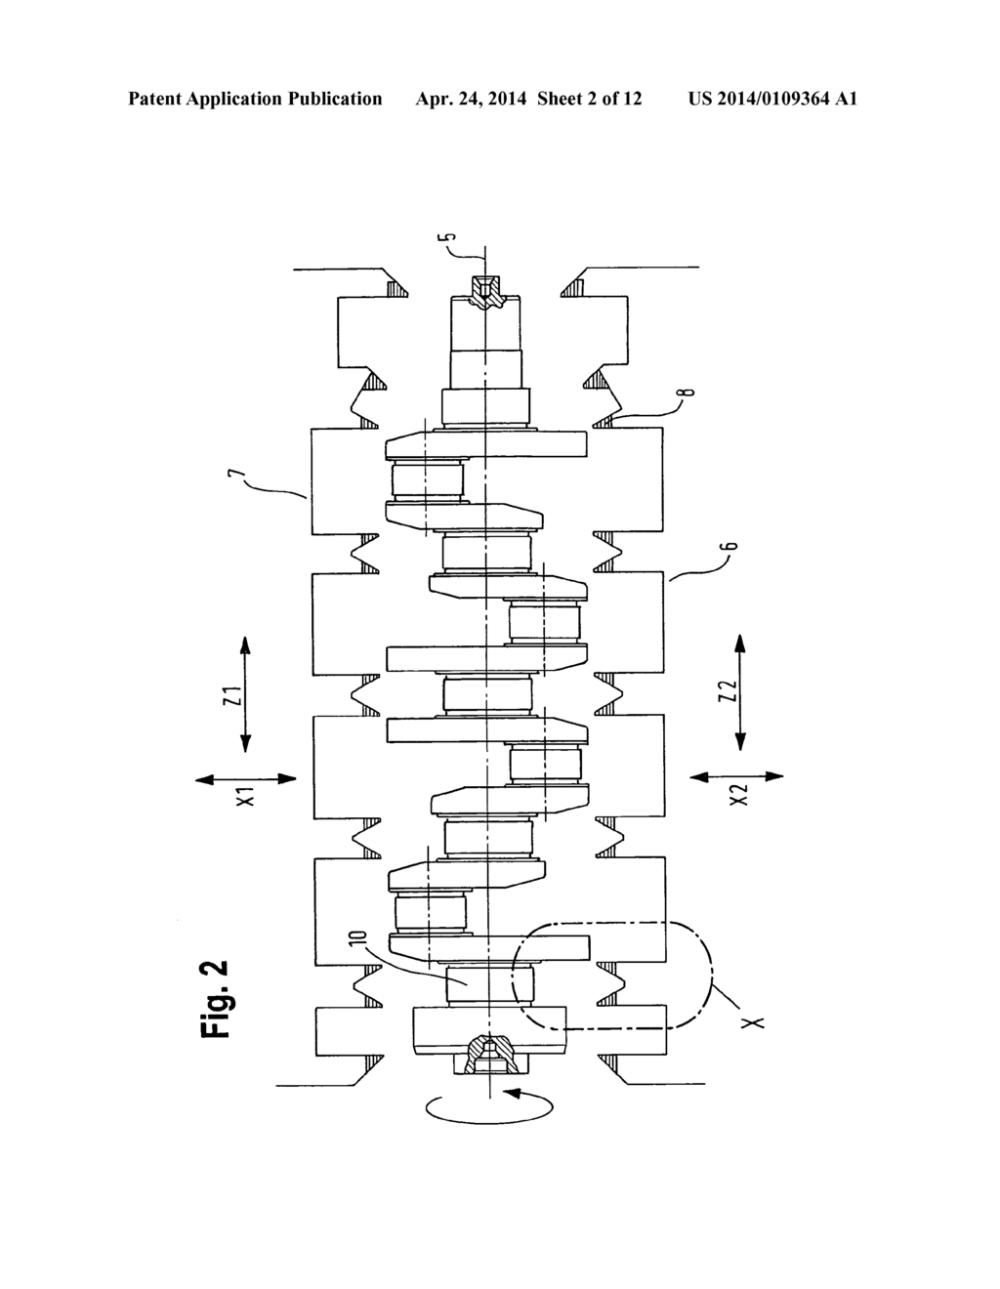 medium resolution of line diagram of crankshaft data schematic diagram line diagram of crankshaft line diagram of crankshaft